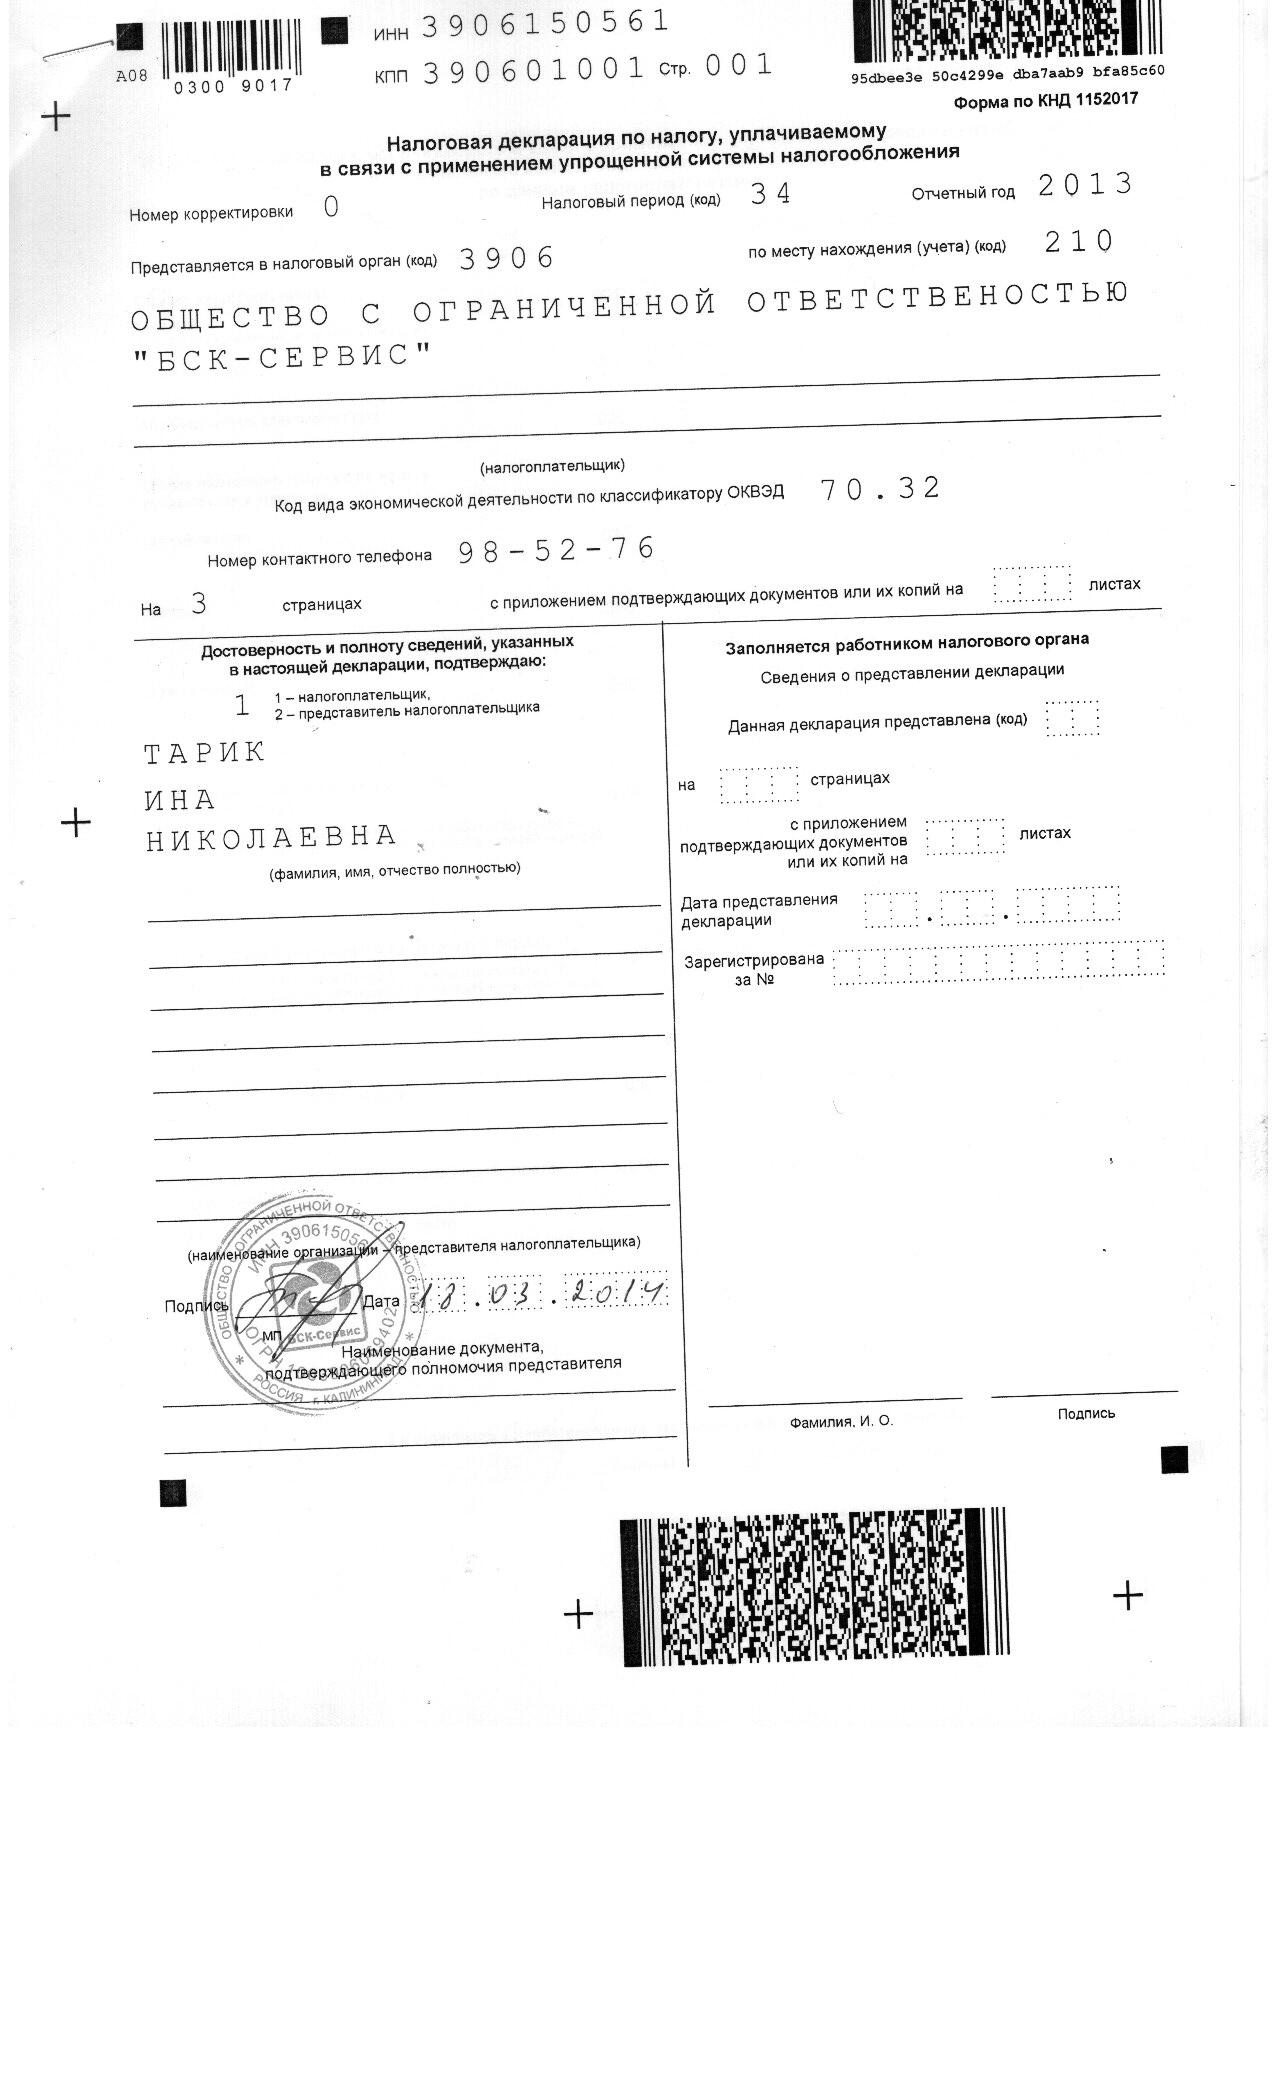 паспорт итп бланк